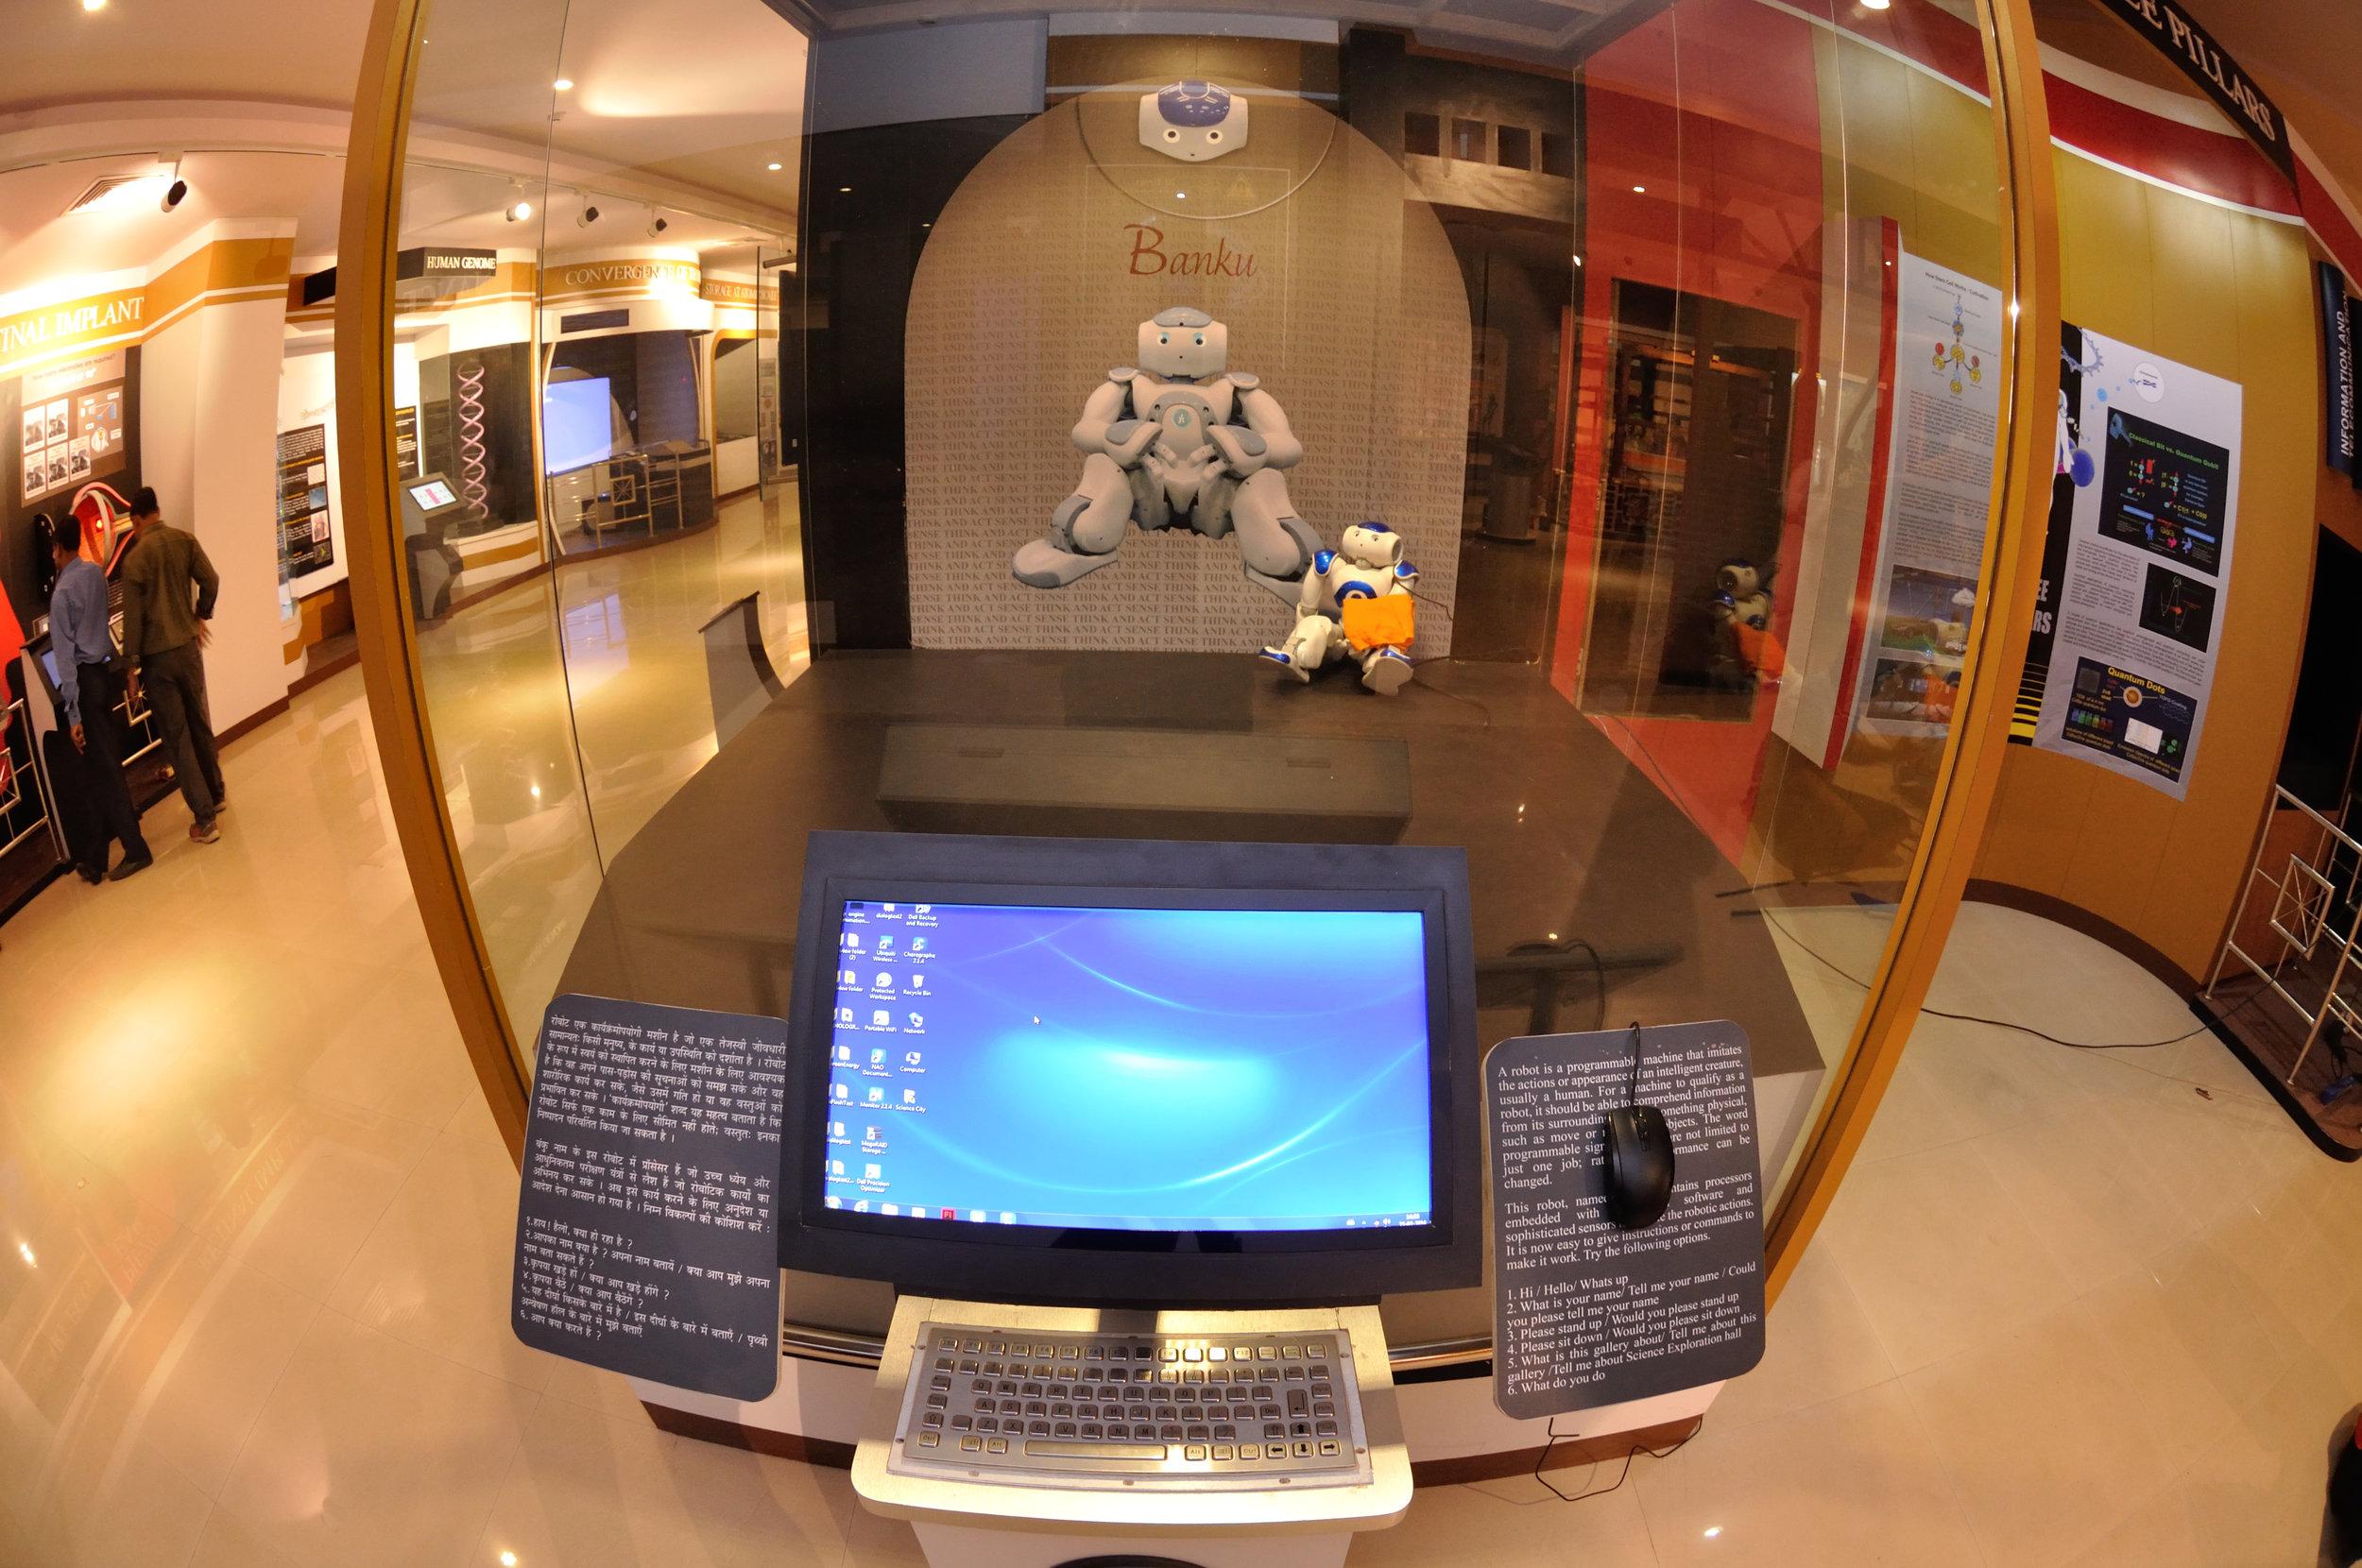 Robotics_-_Emerging_Technologies_Gallery_-_Science_Exploration_Hall_-_Science_City_-_Kolkata_2016-02-23_0605 (1).JPG